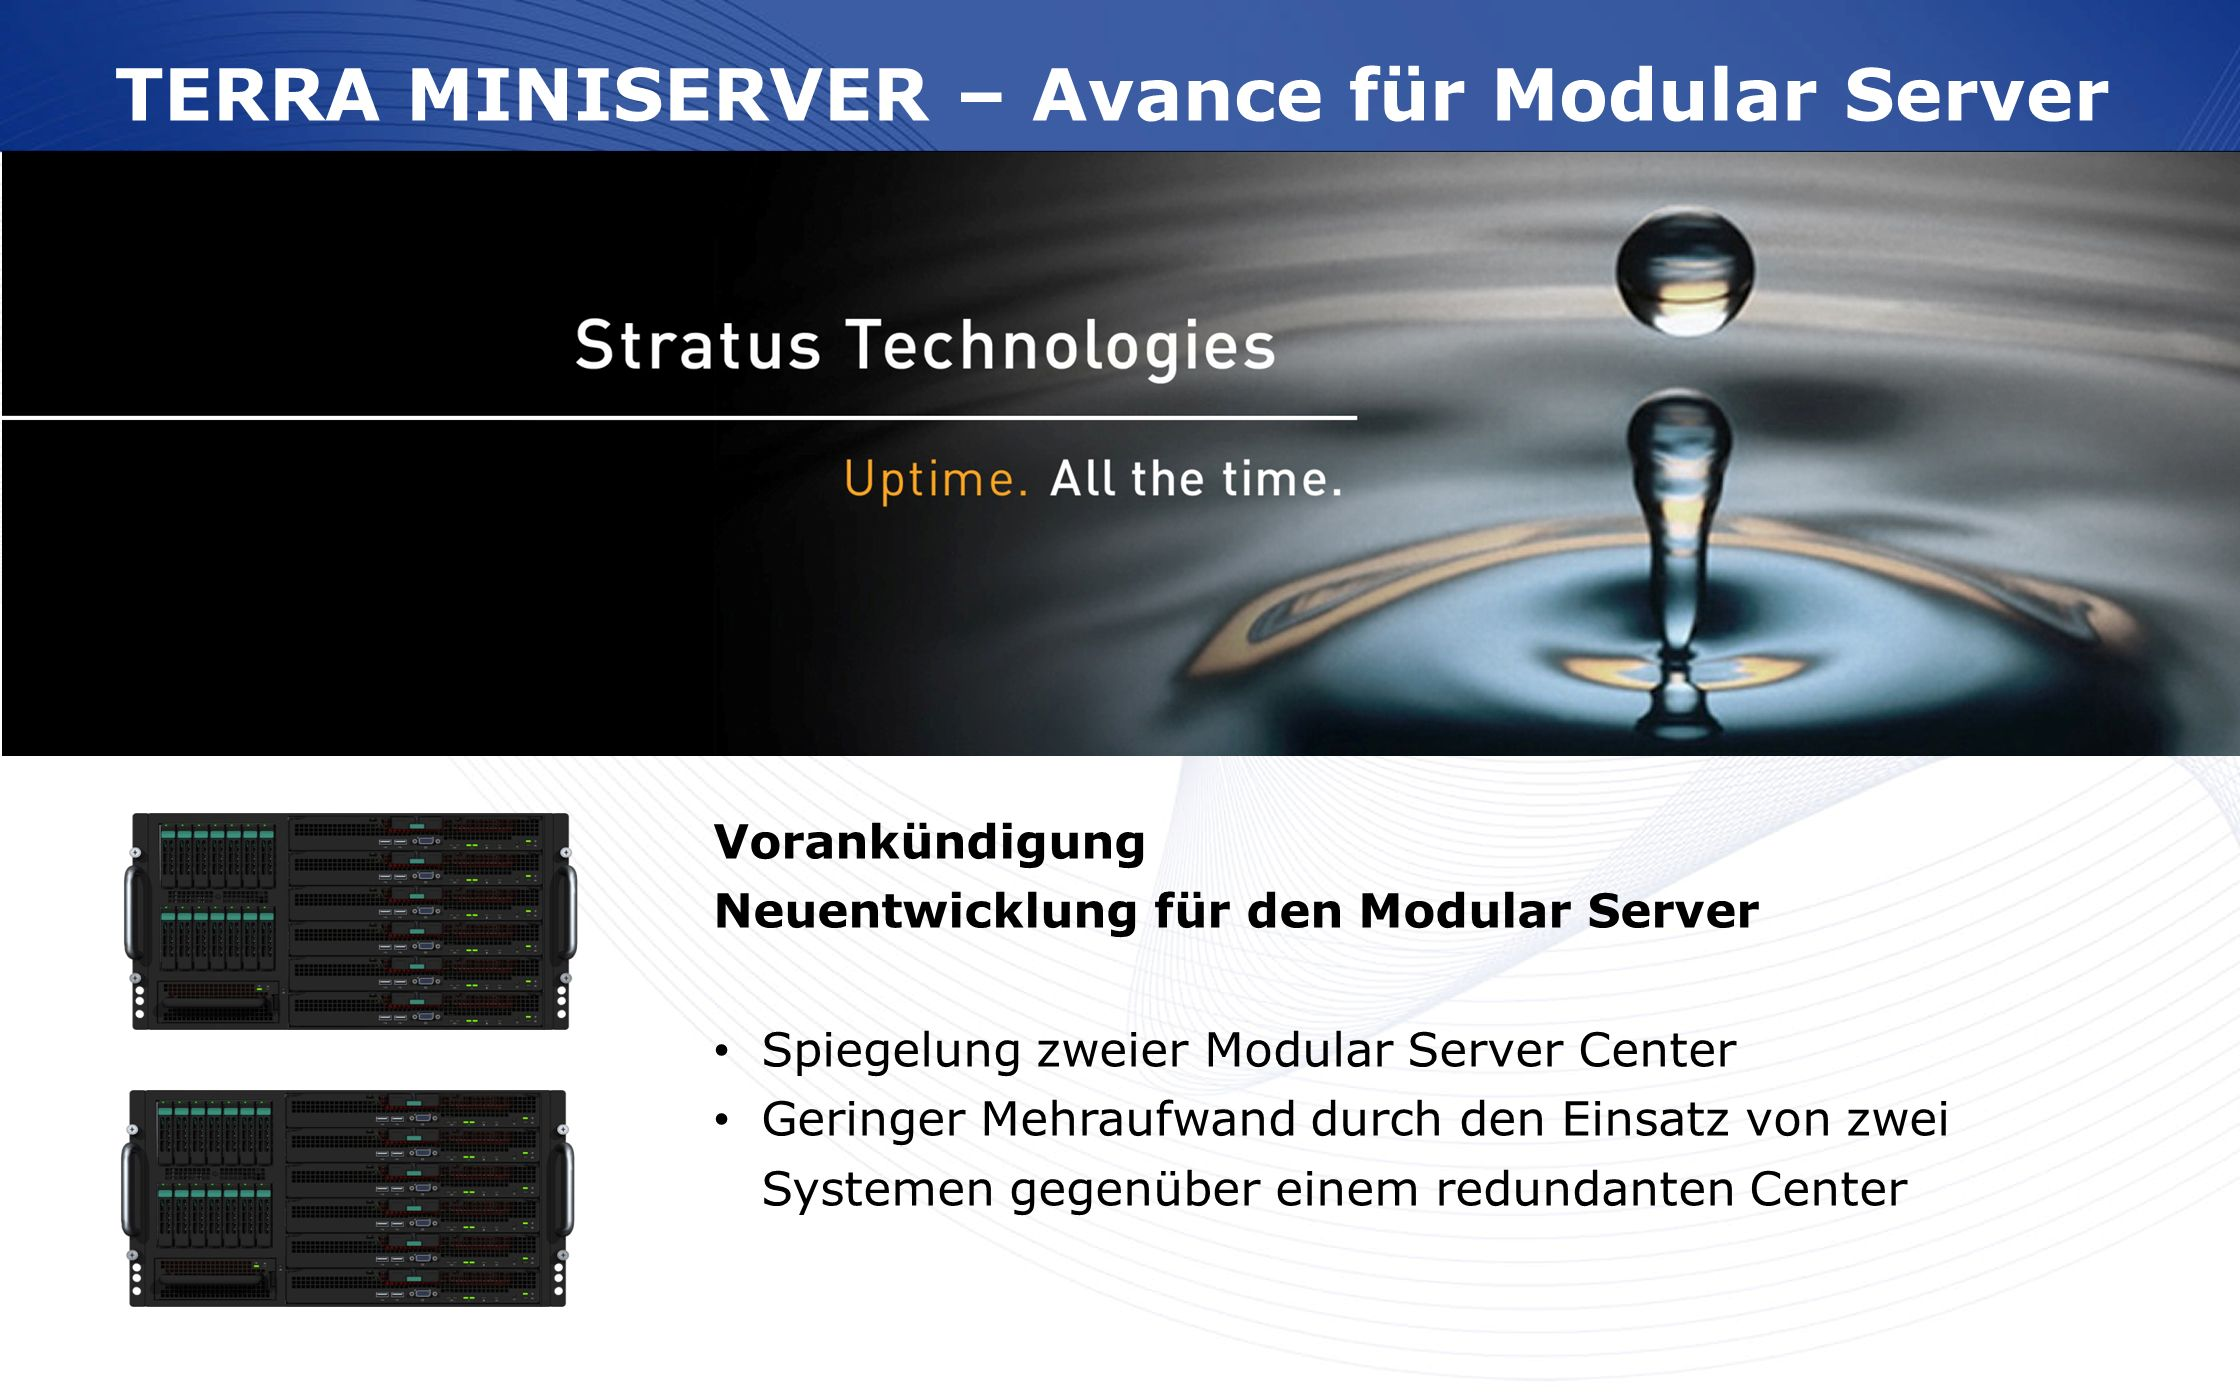 TERRA MINISERVER – Avance für Modular Server